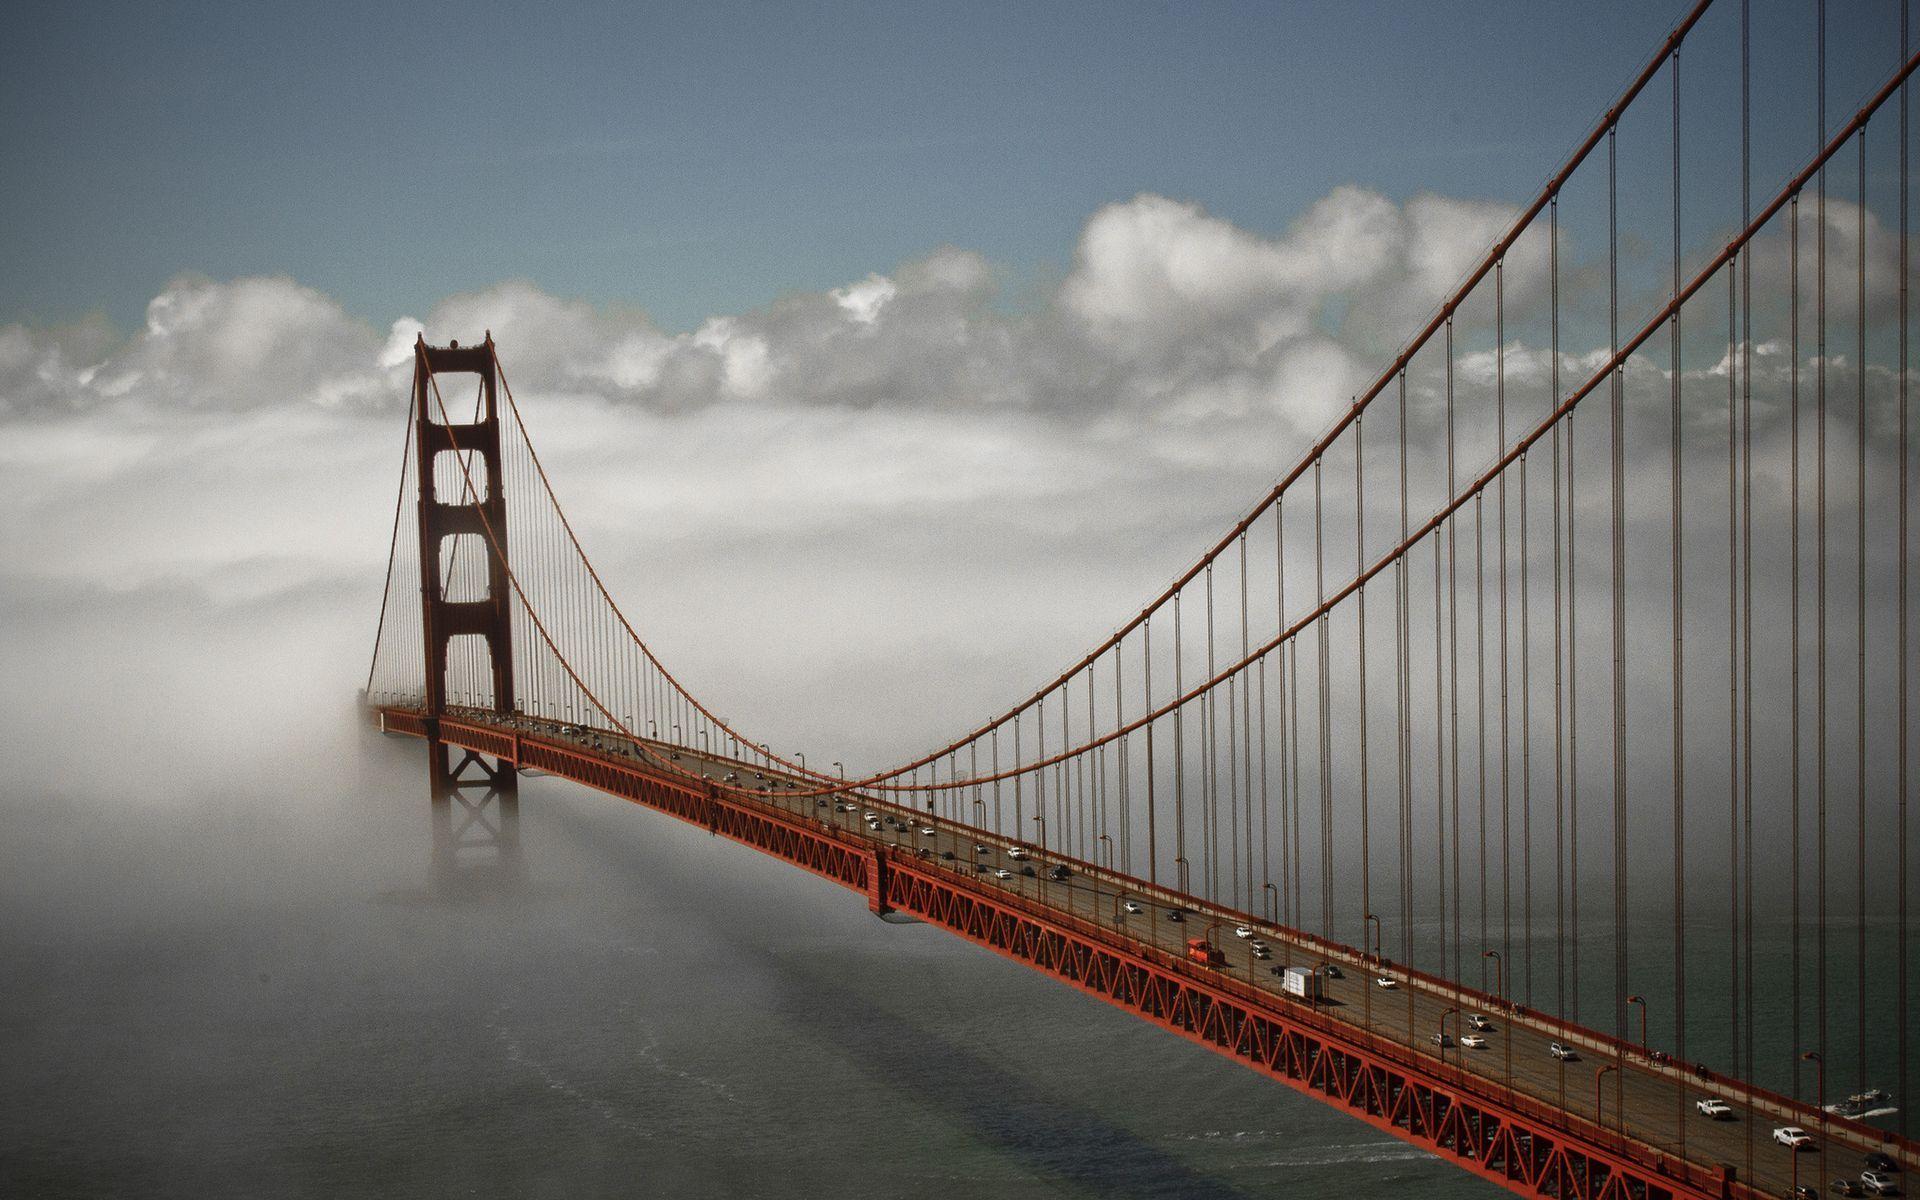 Building Construction Wallpaper Hd Golden Gate Bridge History Park And Photo Gallery